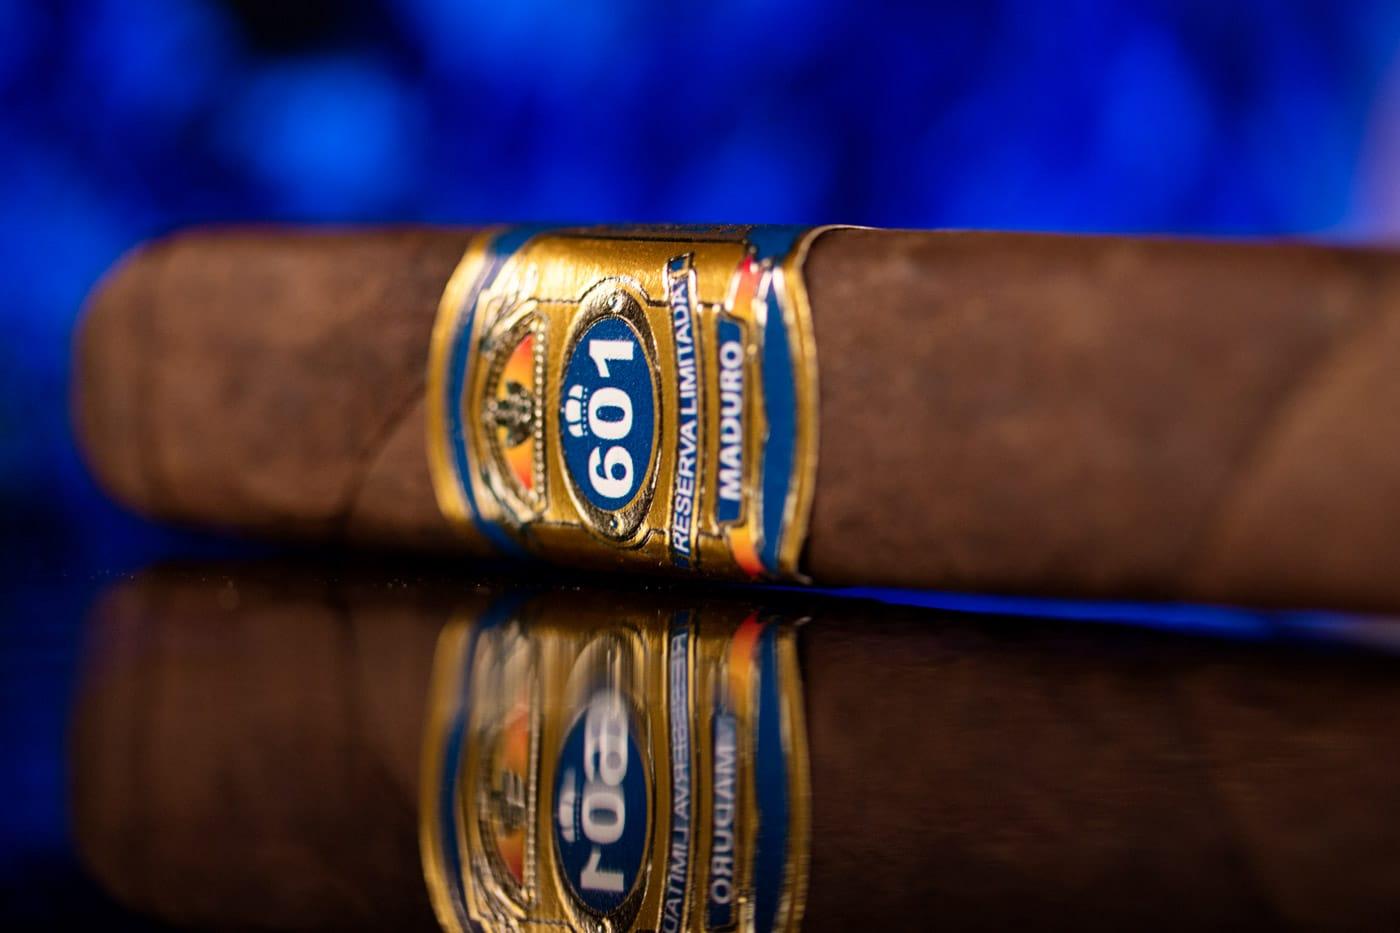 Espinosa 601 Blue Label Maduro Short Churchill cigar review